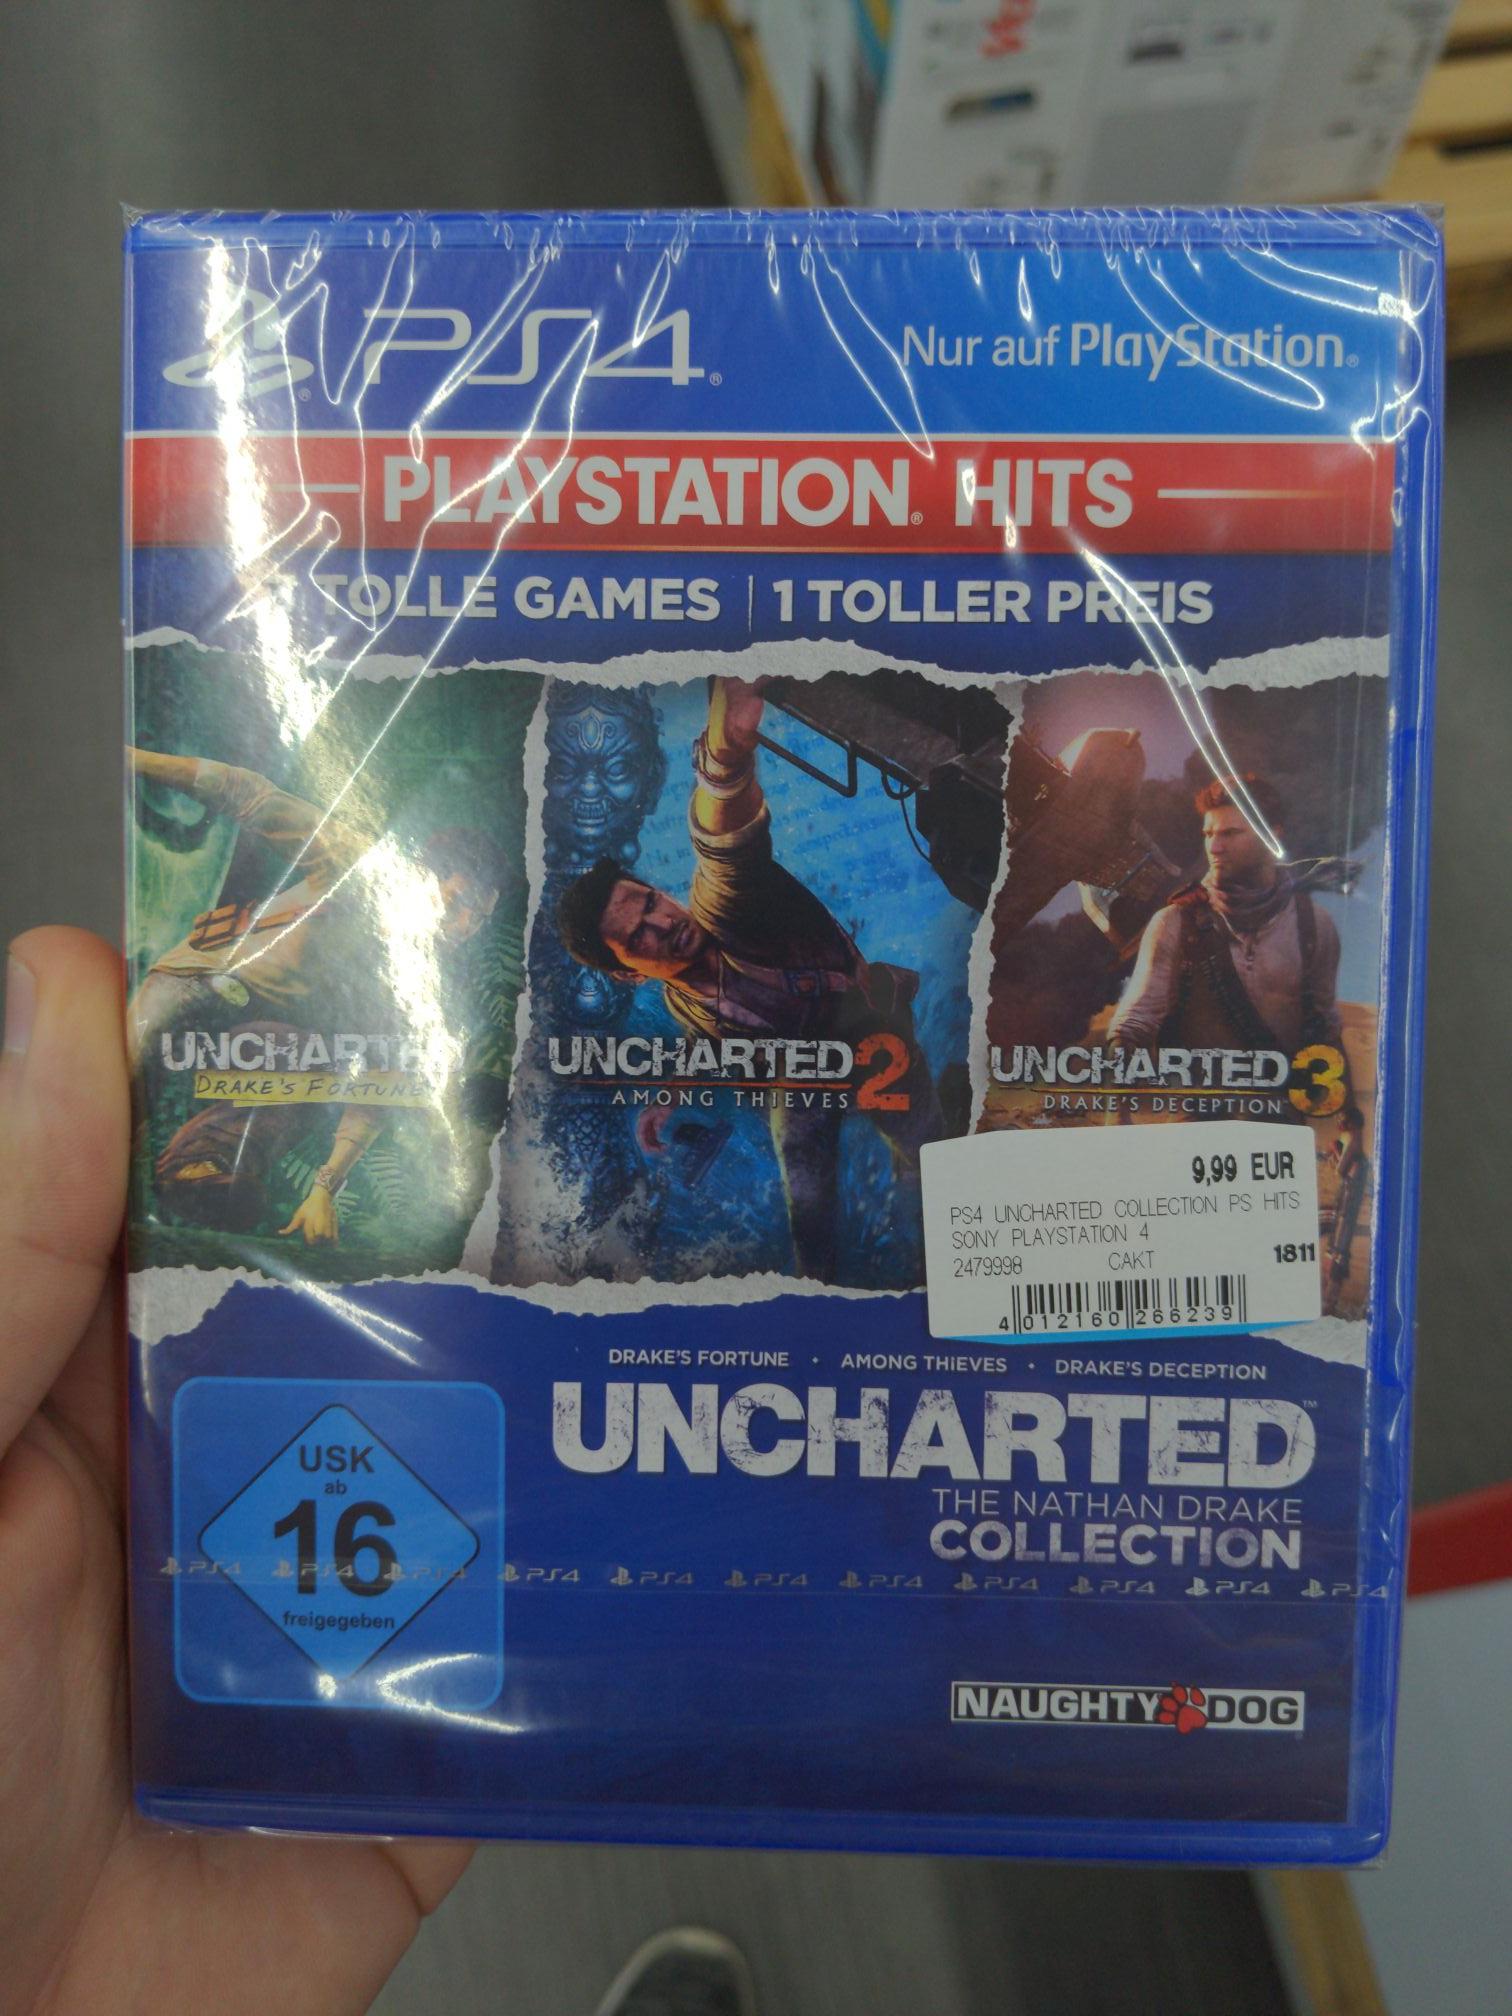 [PS4] Uncharted Collection [Mediamarkt] Abverkauf